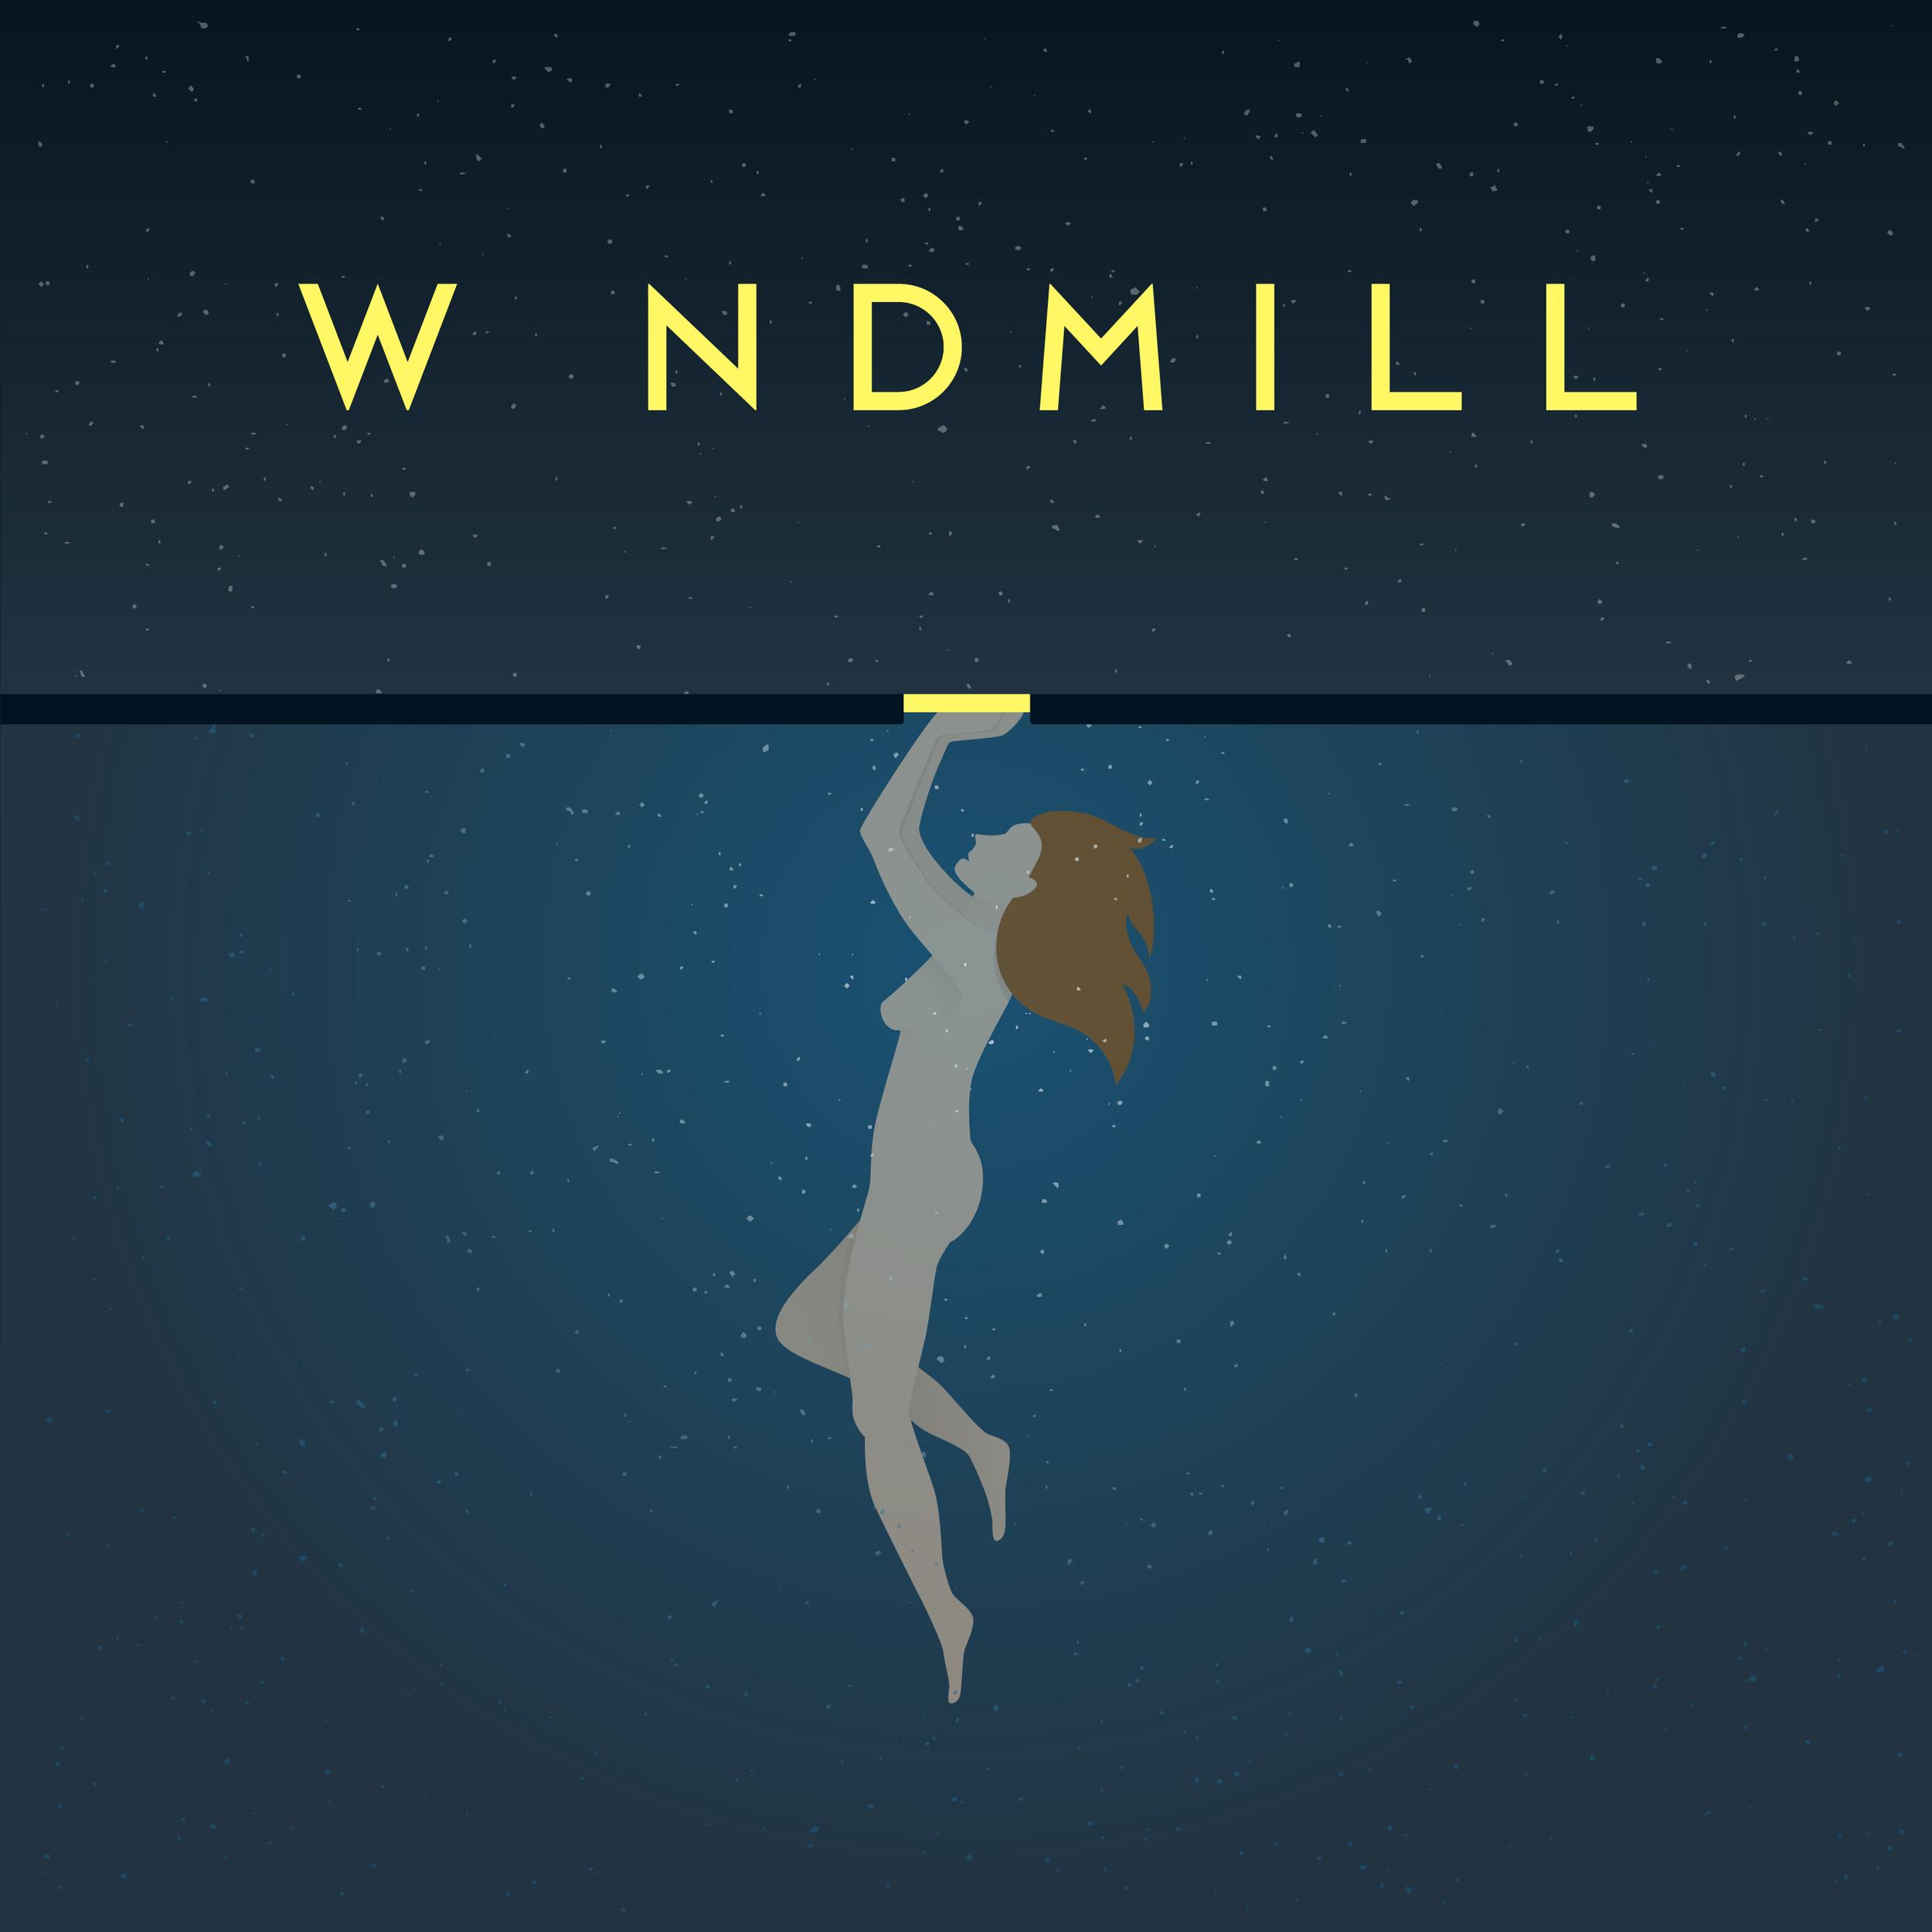 Windmill_Single2_Artwork.png